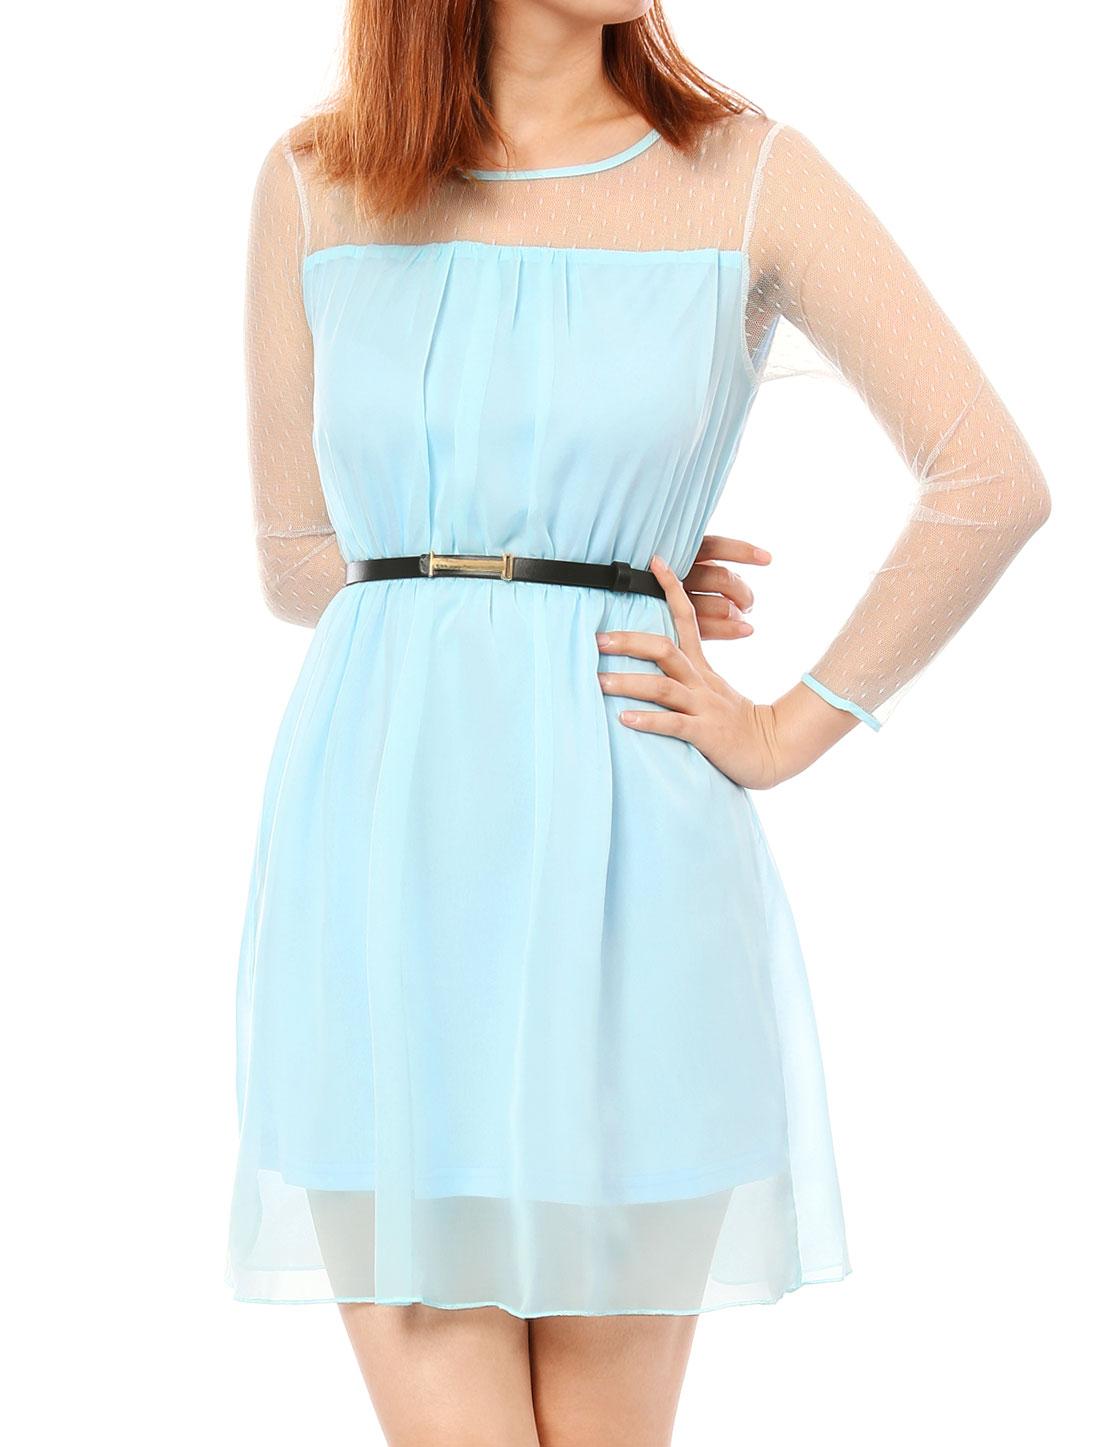 Ladies Light Blue Round Neck Waist Belt Long Sleeves Dress XS